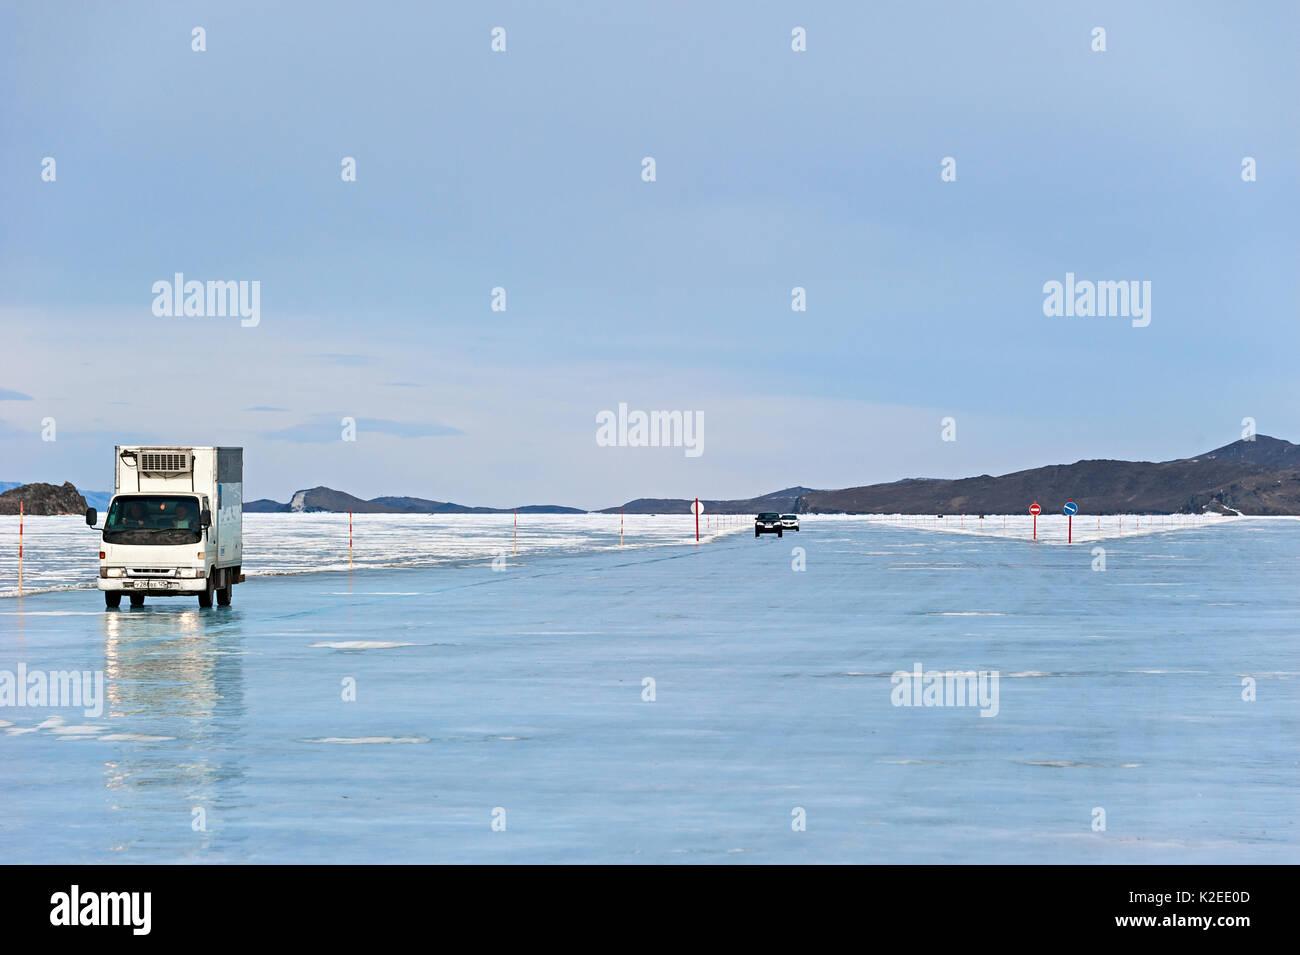 Baikal Ice Car Stock Photos & Baikal Ice Car Stock Images - Alamy